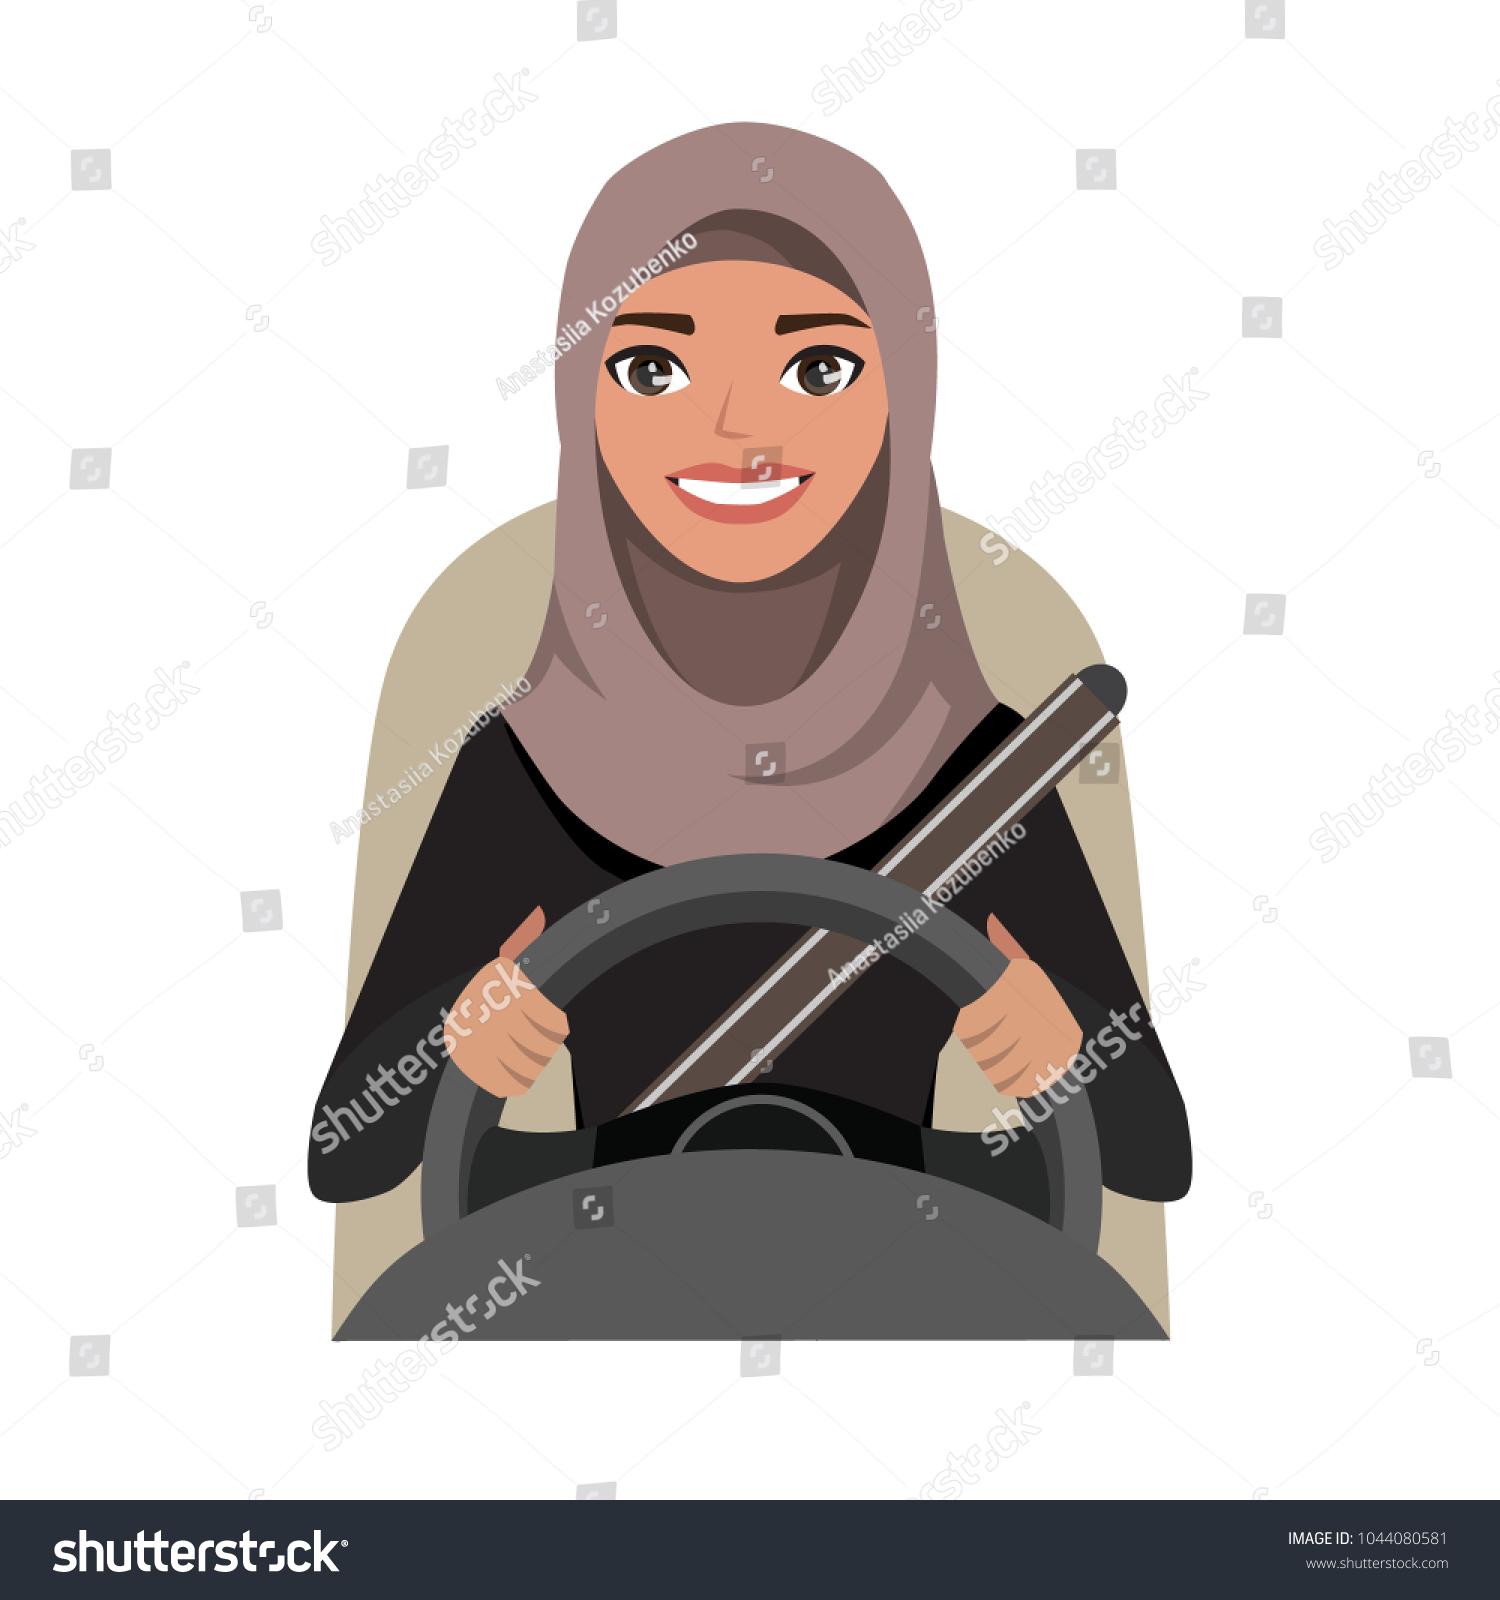 Arab businesswoman driving a car. Arab woman wearing hijab